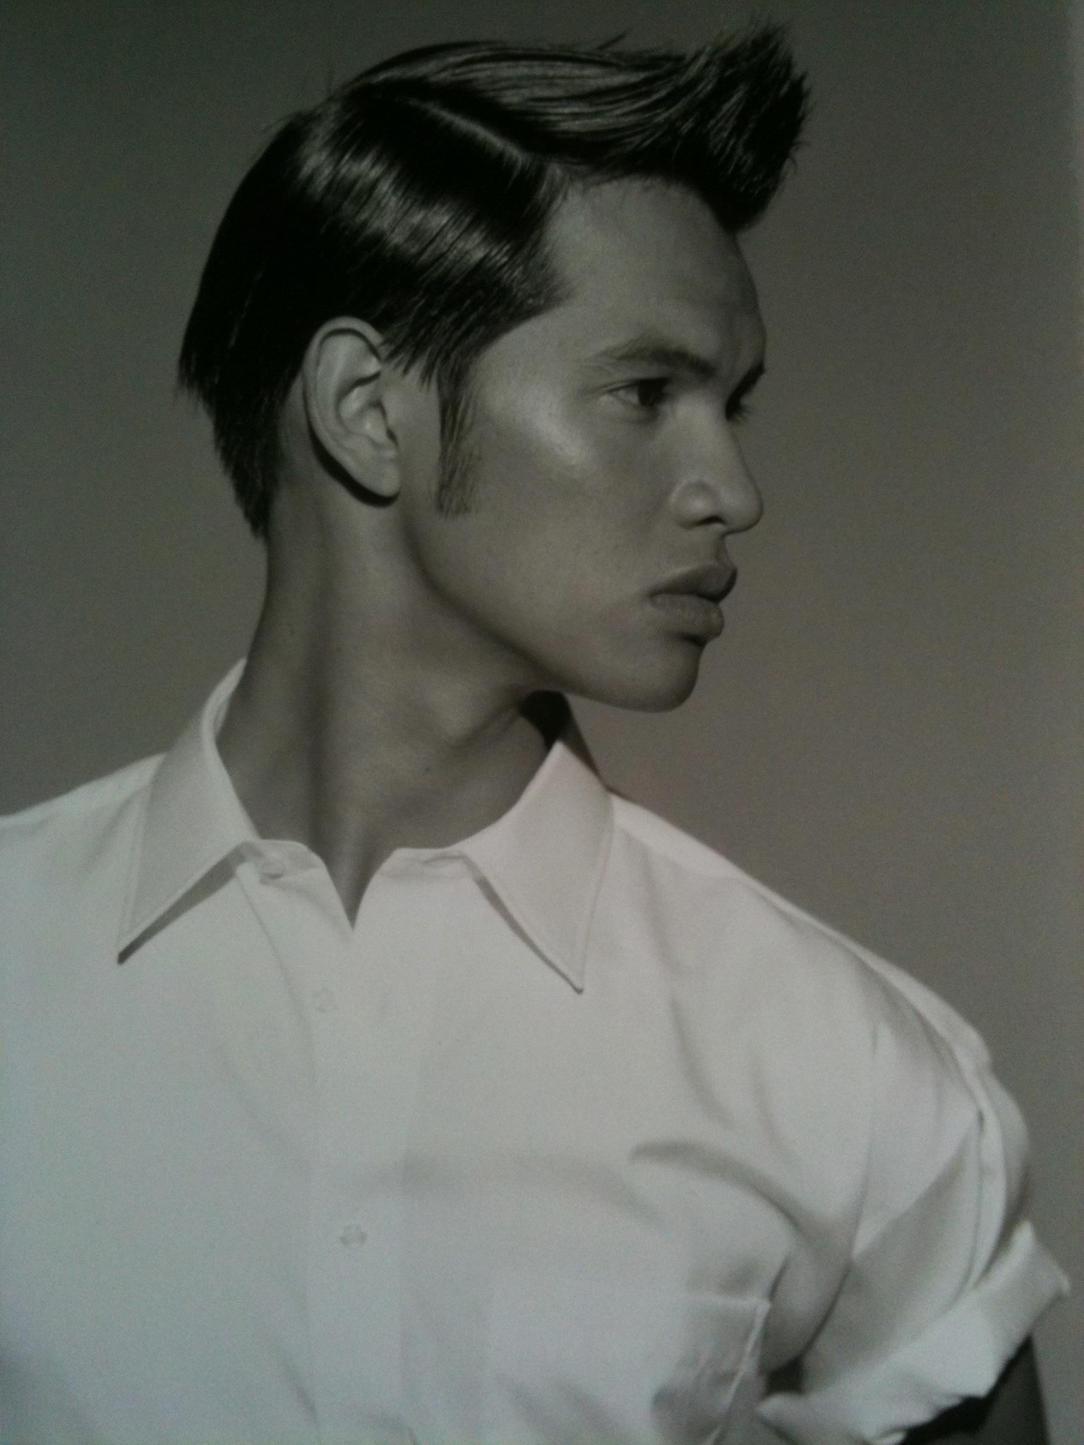 Laurindo hair model